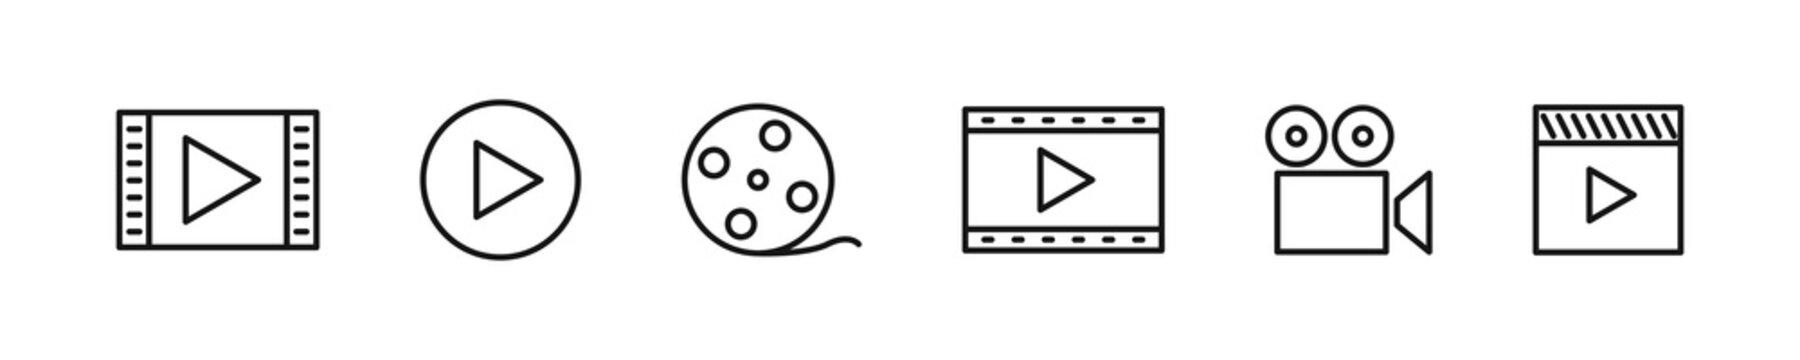 Video play button set. Vector playback icon collection.